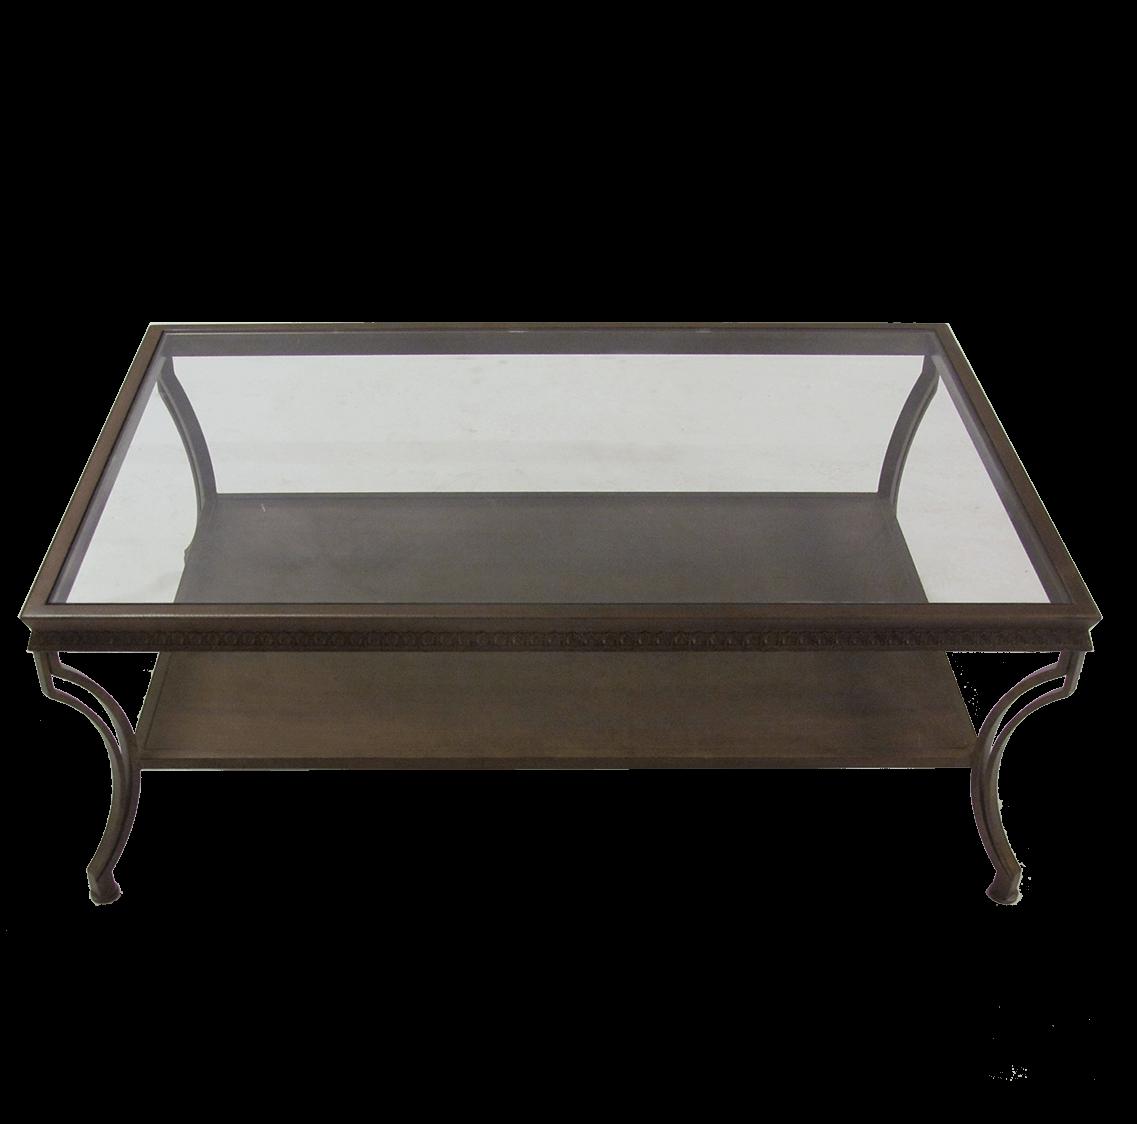 252511_Kolkka_Furniture_Bella_Cocktail_Table